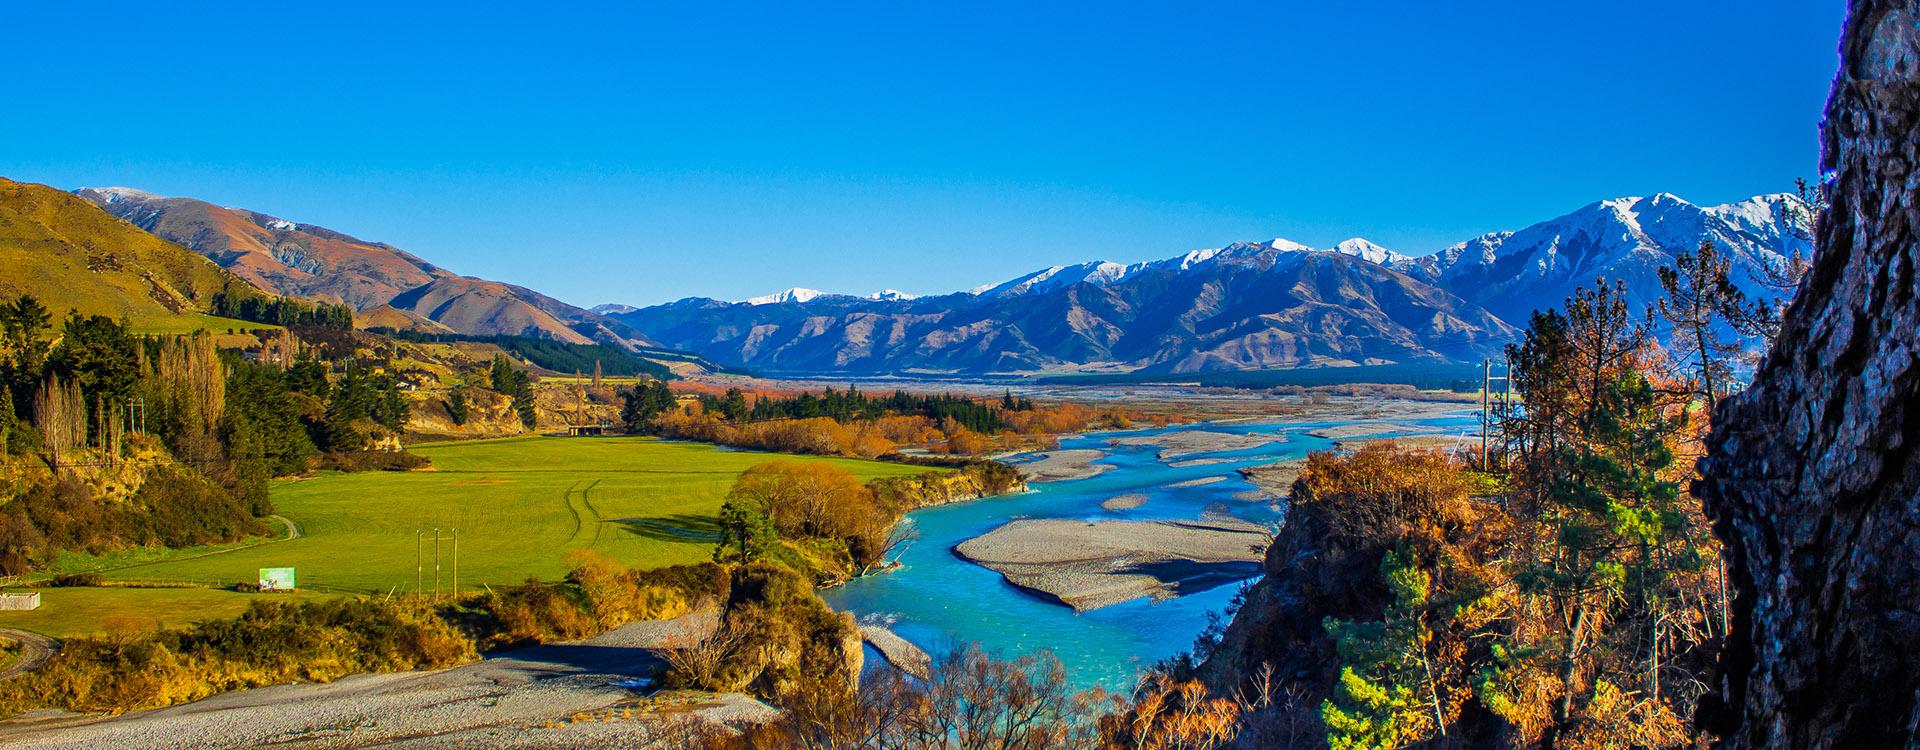 Hurunui river in Southern Alps, Canterbury, New Zealand